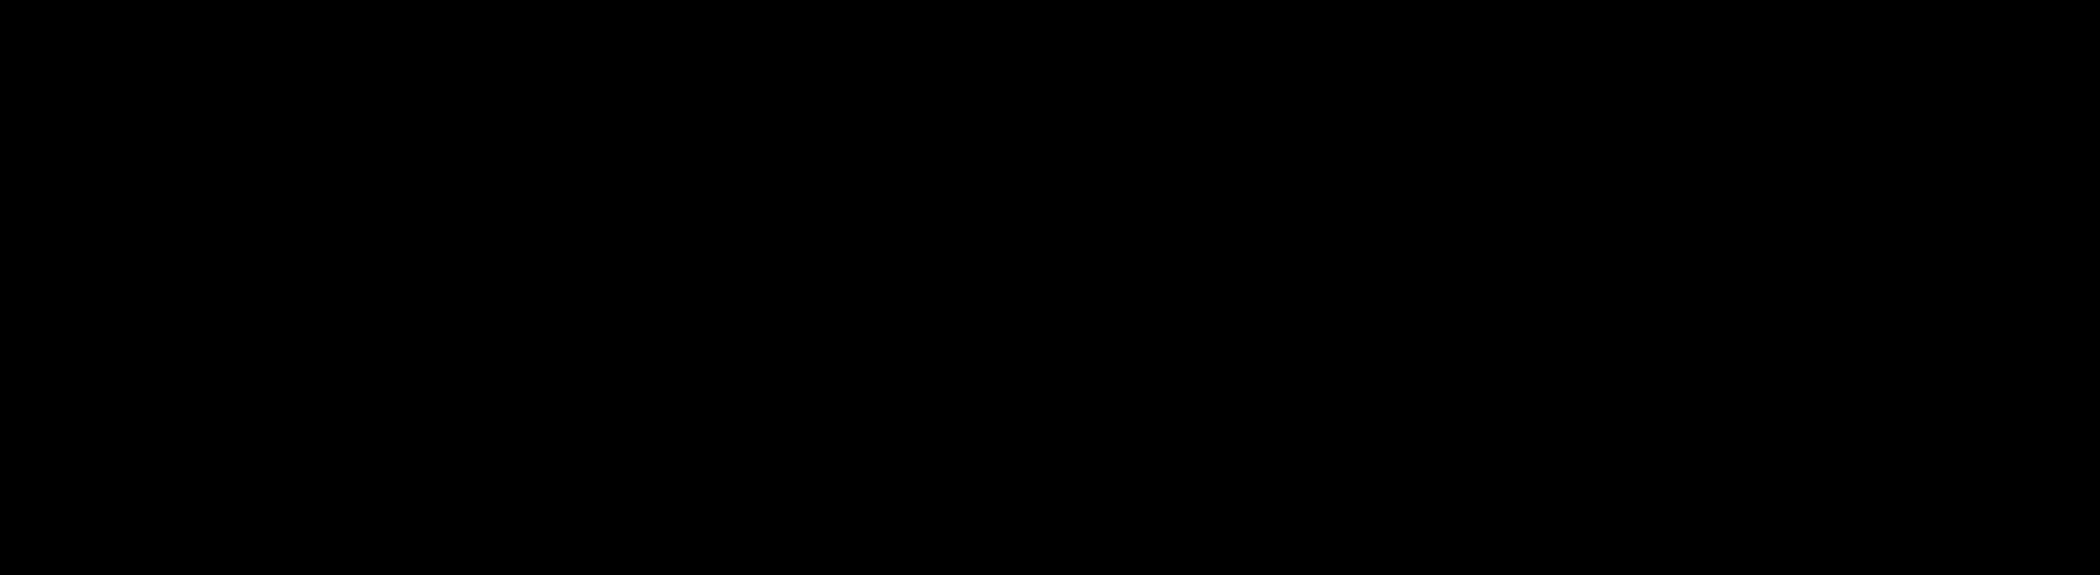 napster logo 1 - Napster Logo